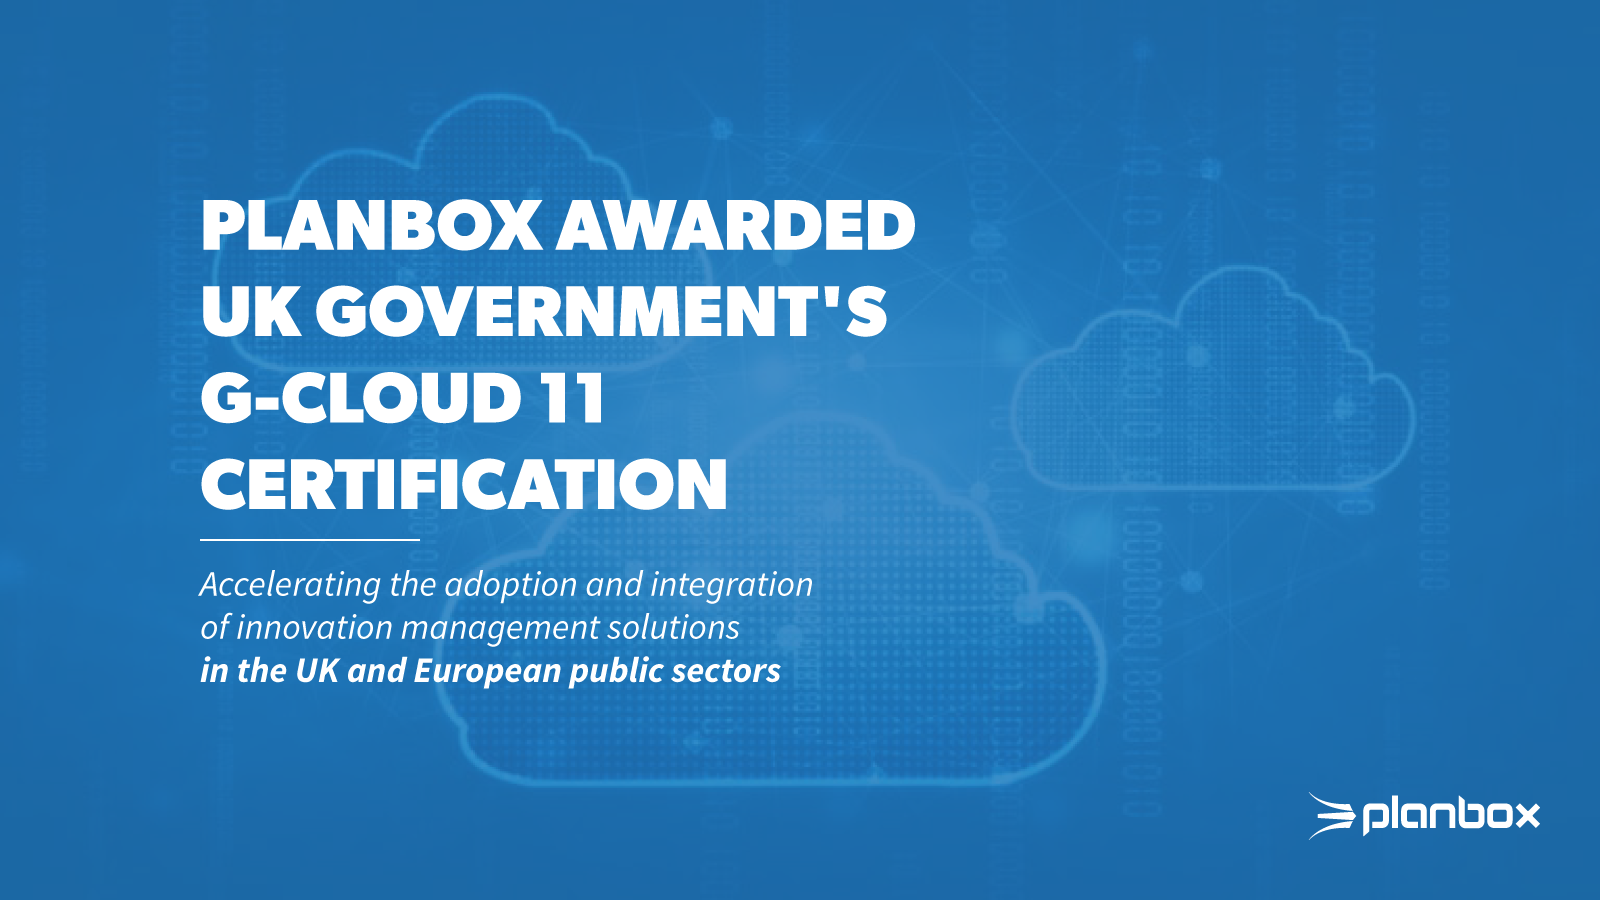 G-Cloud 11 Certification